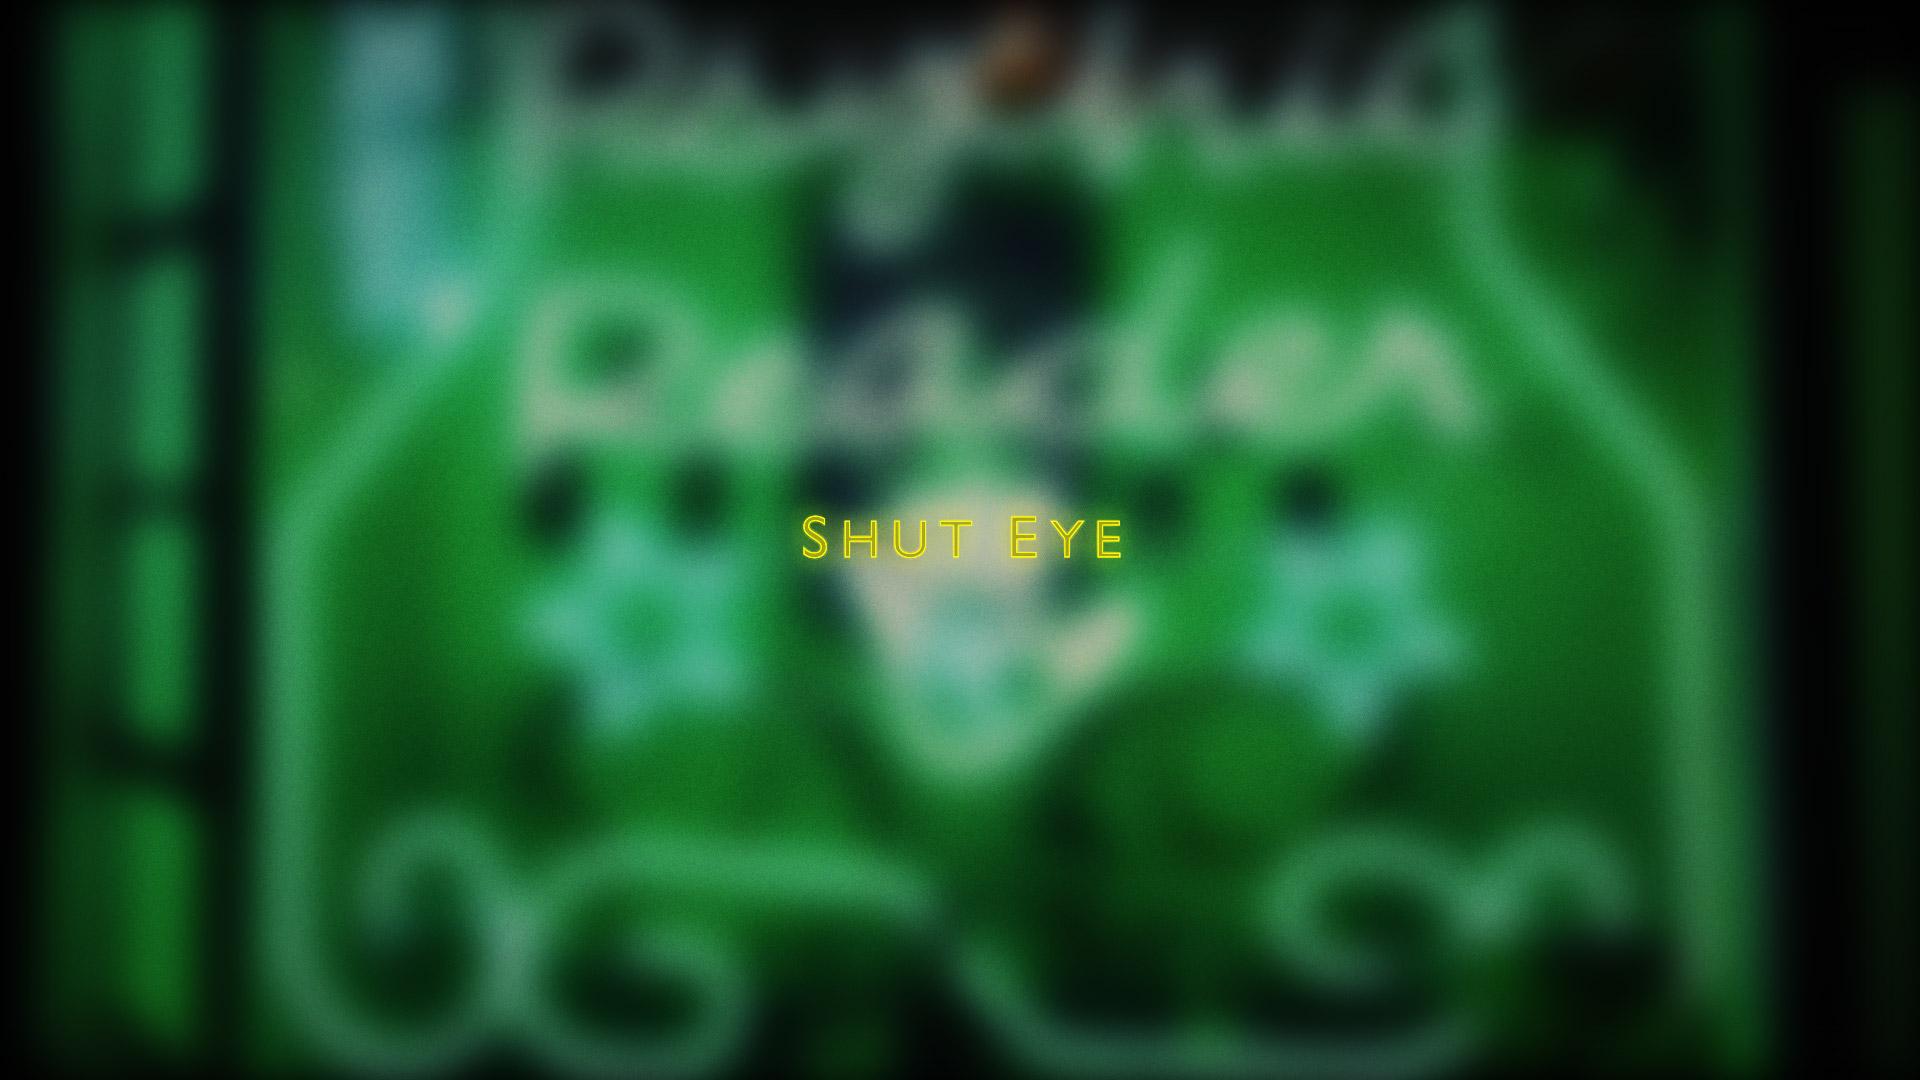 tcgstudio-shut-eye-main-title-v3_00004.jpg